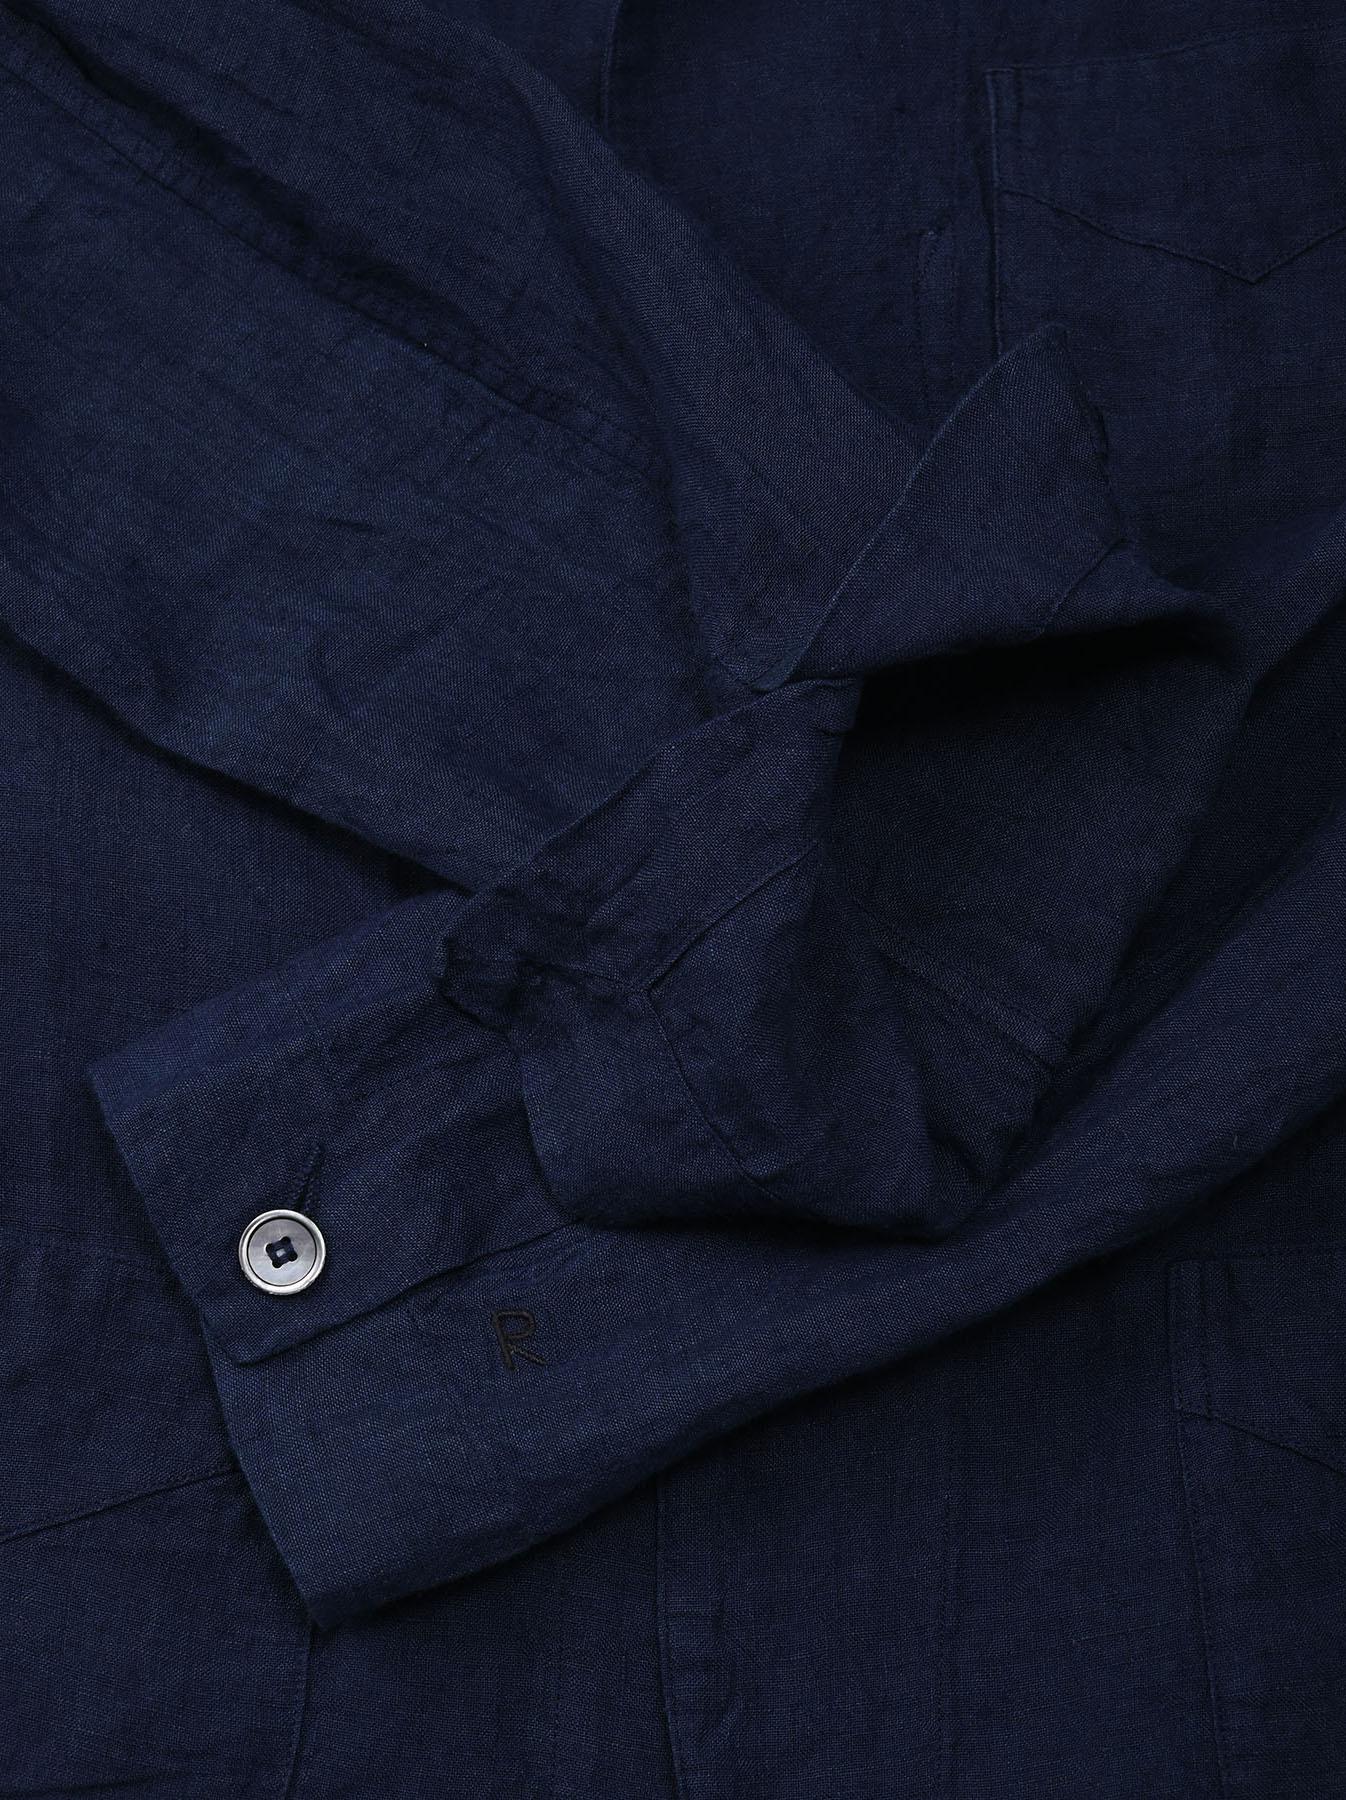 Indigo Indian Linen Flat Shirt Jacket (0521)-9